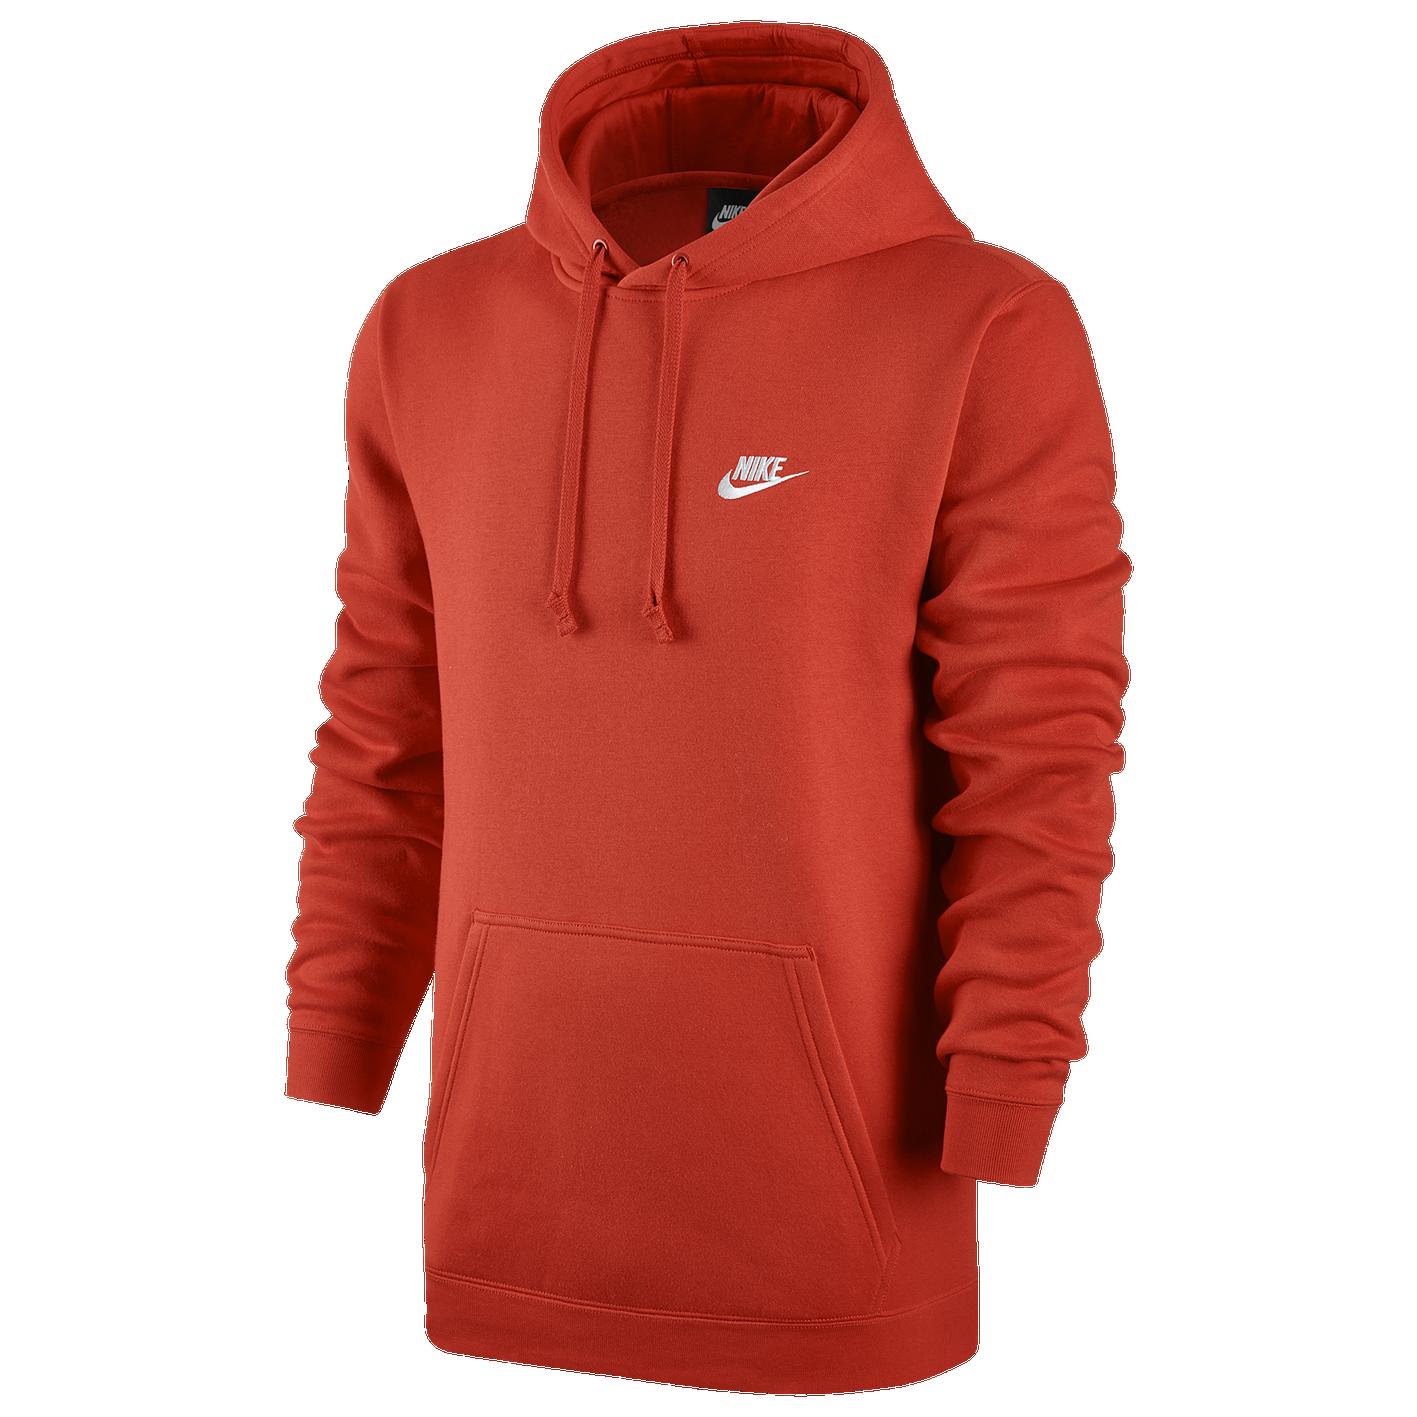 6c8fcf039 Nike Club Fleece Pullover Hoodie - Men's - Casual - Clothing - Team ...